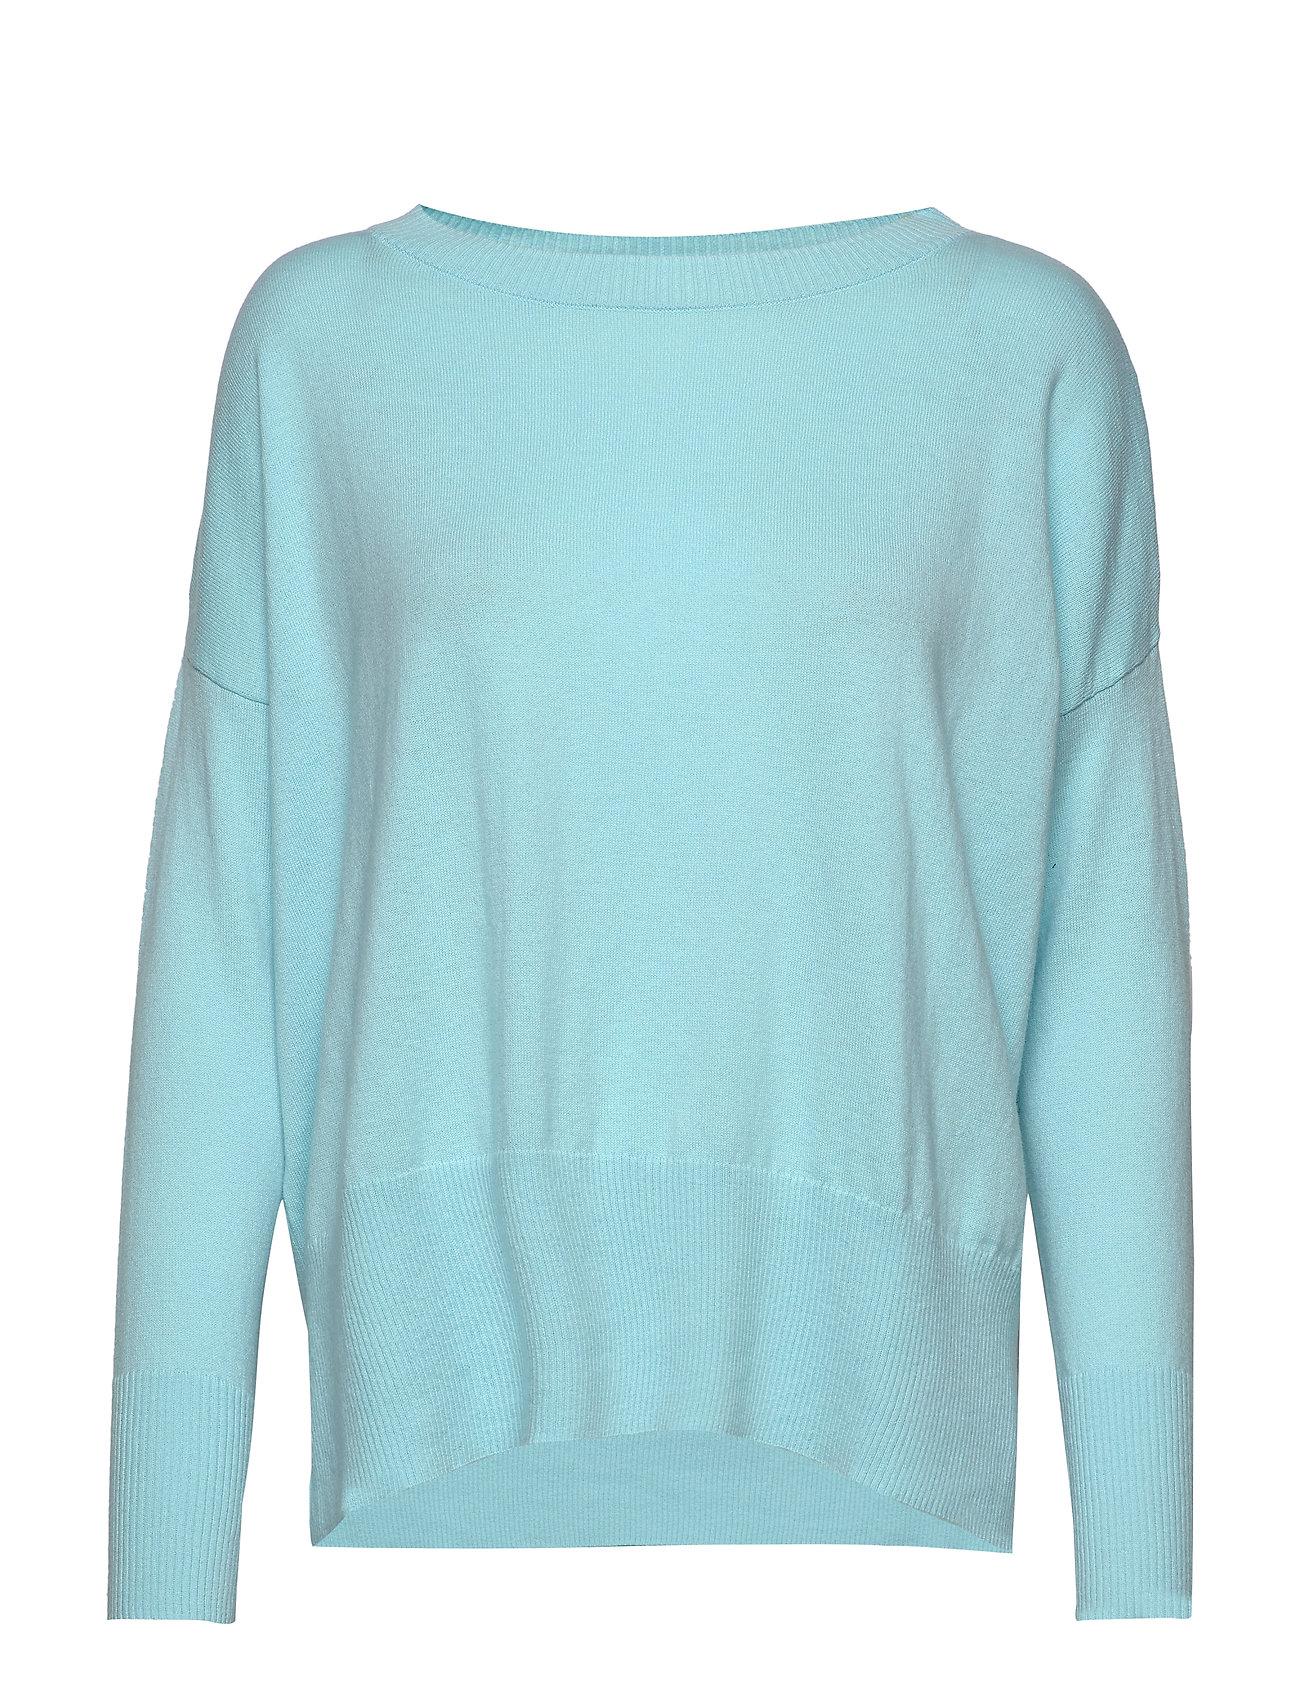 Nanso Ladies knit sweater, Villis - LIGHT BLUE